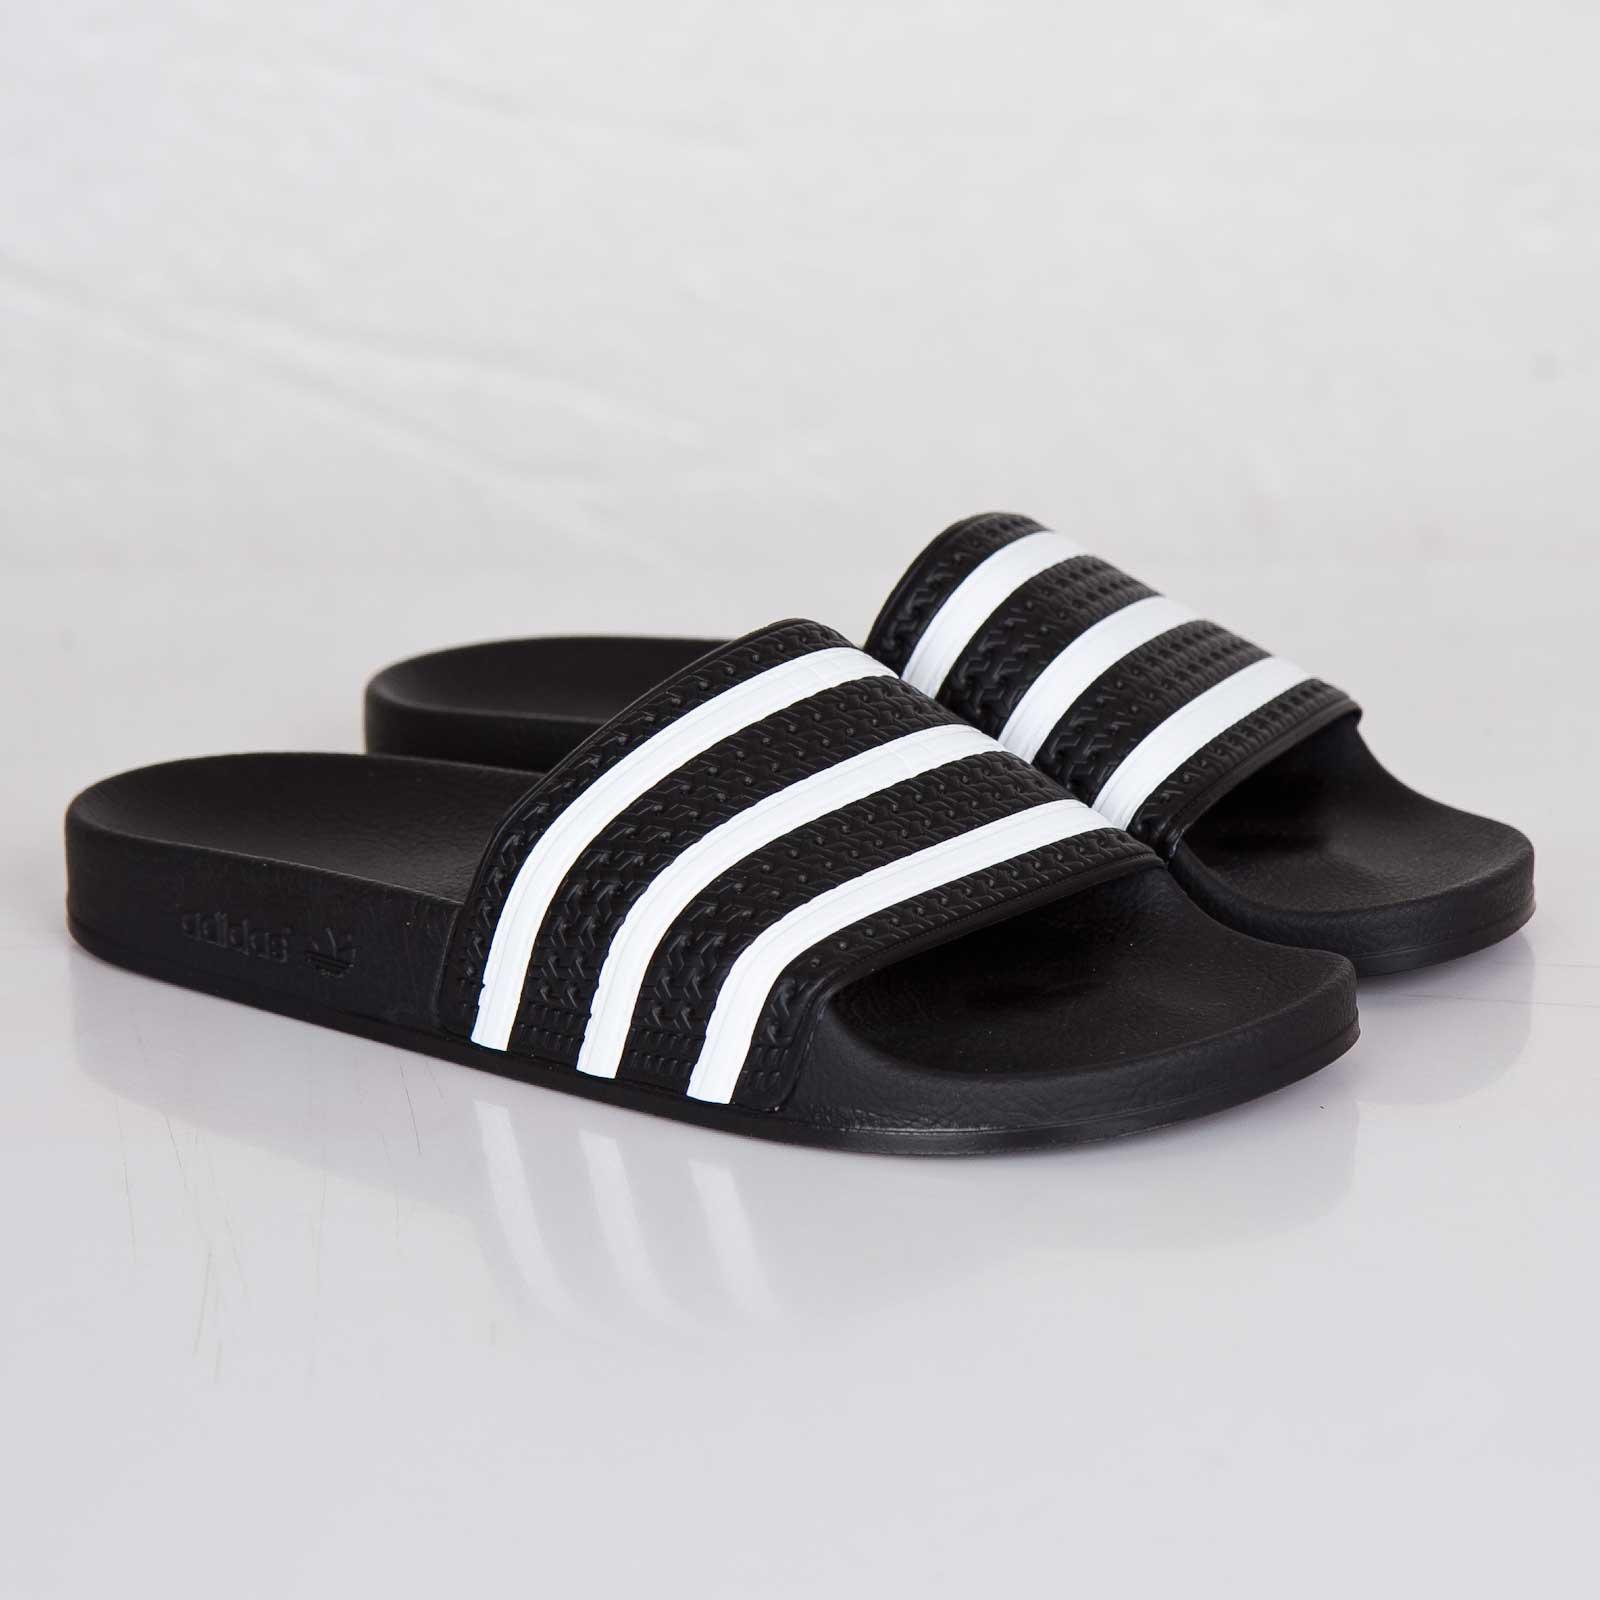 7a7a7eccf adidas Adilette - 280647 - Sneakersnstuff